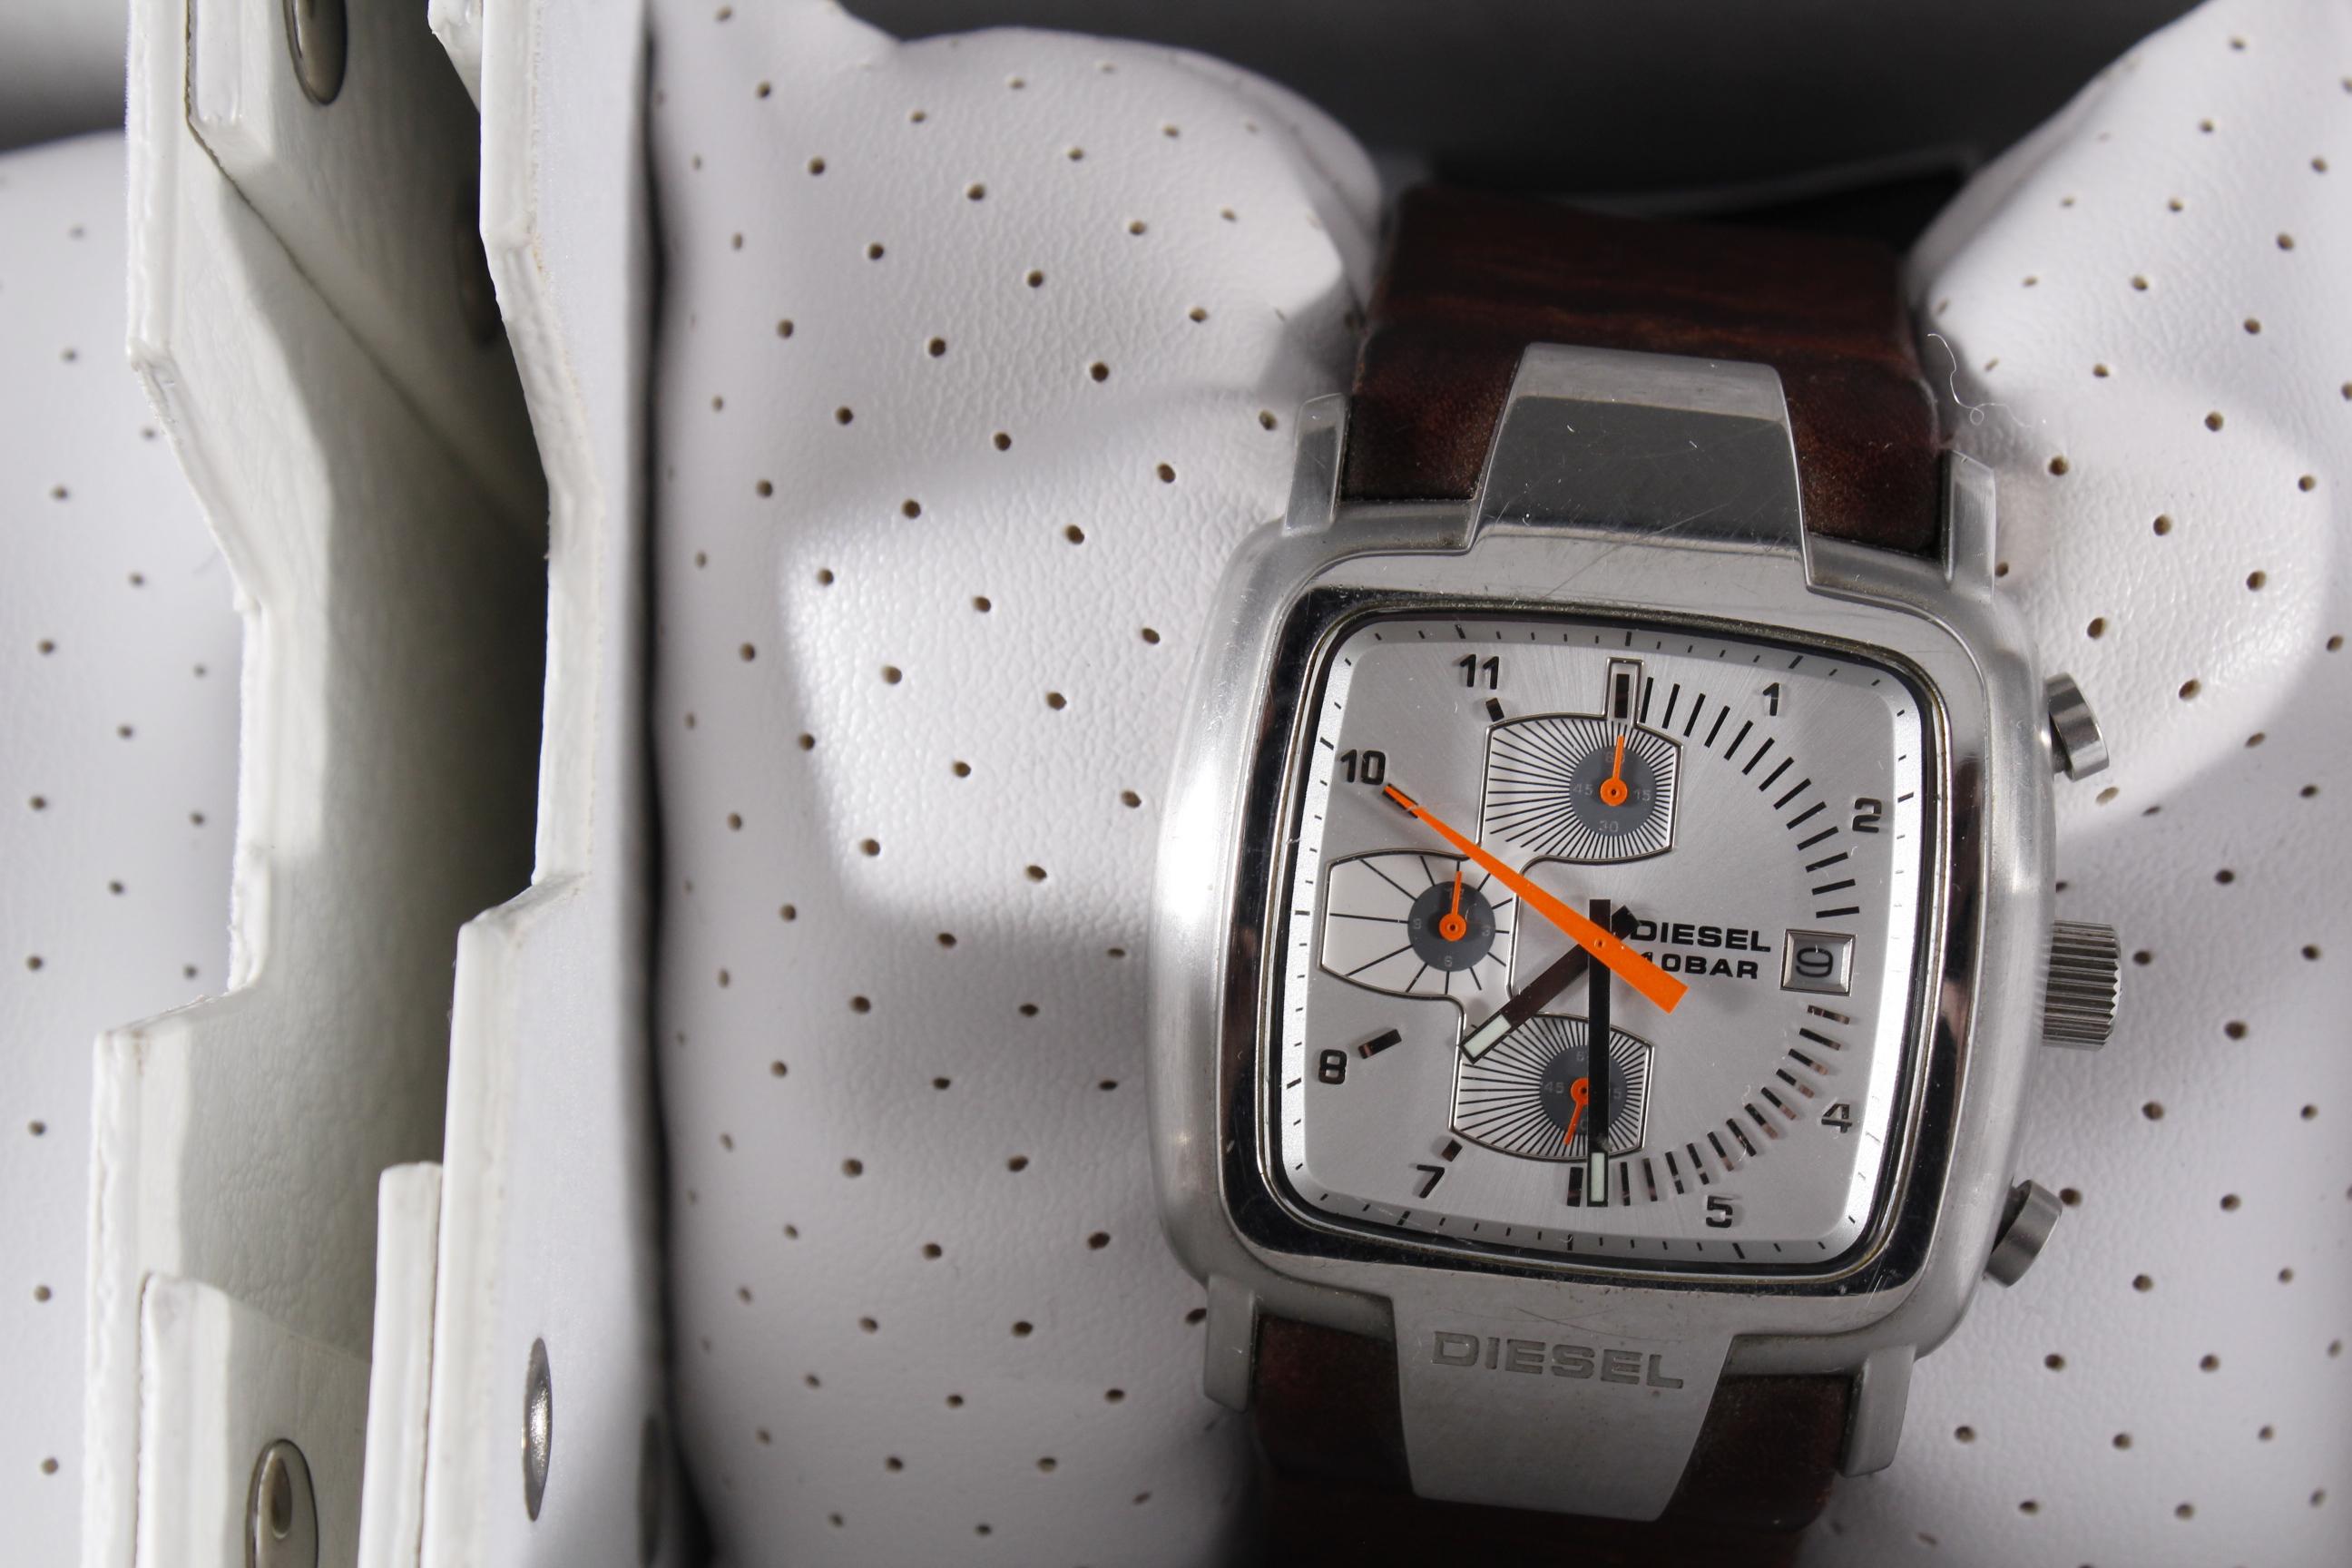 Diesel Armbanduhren